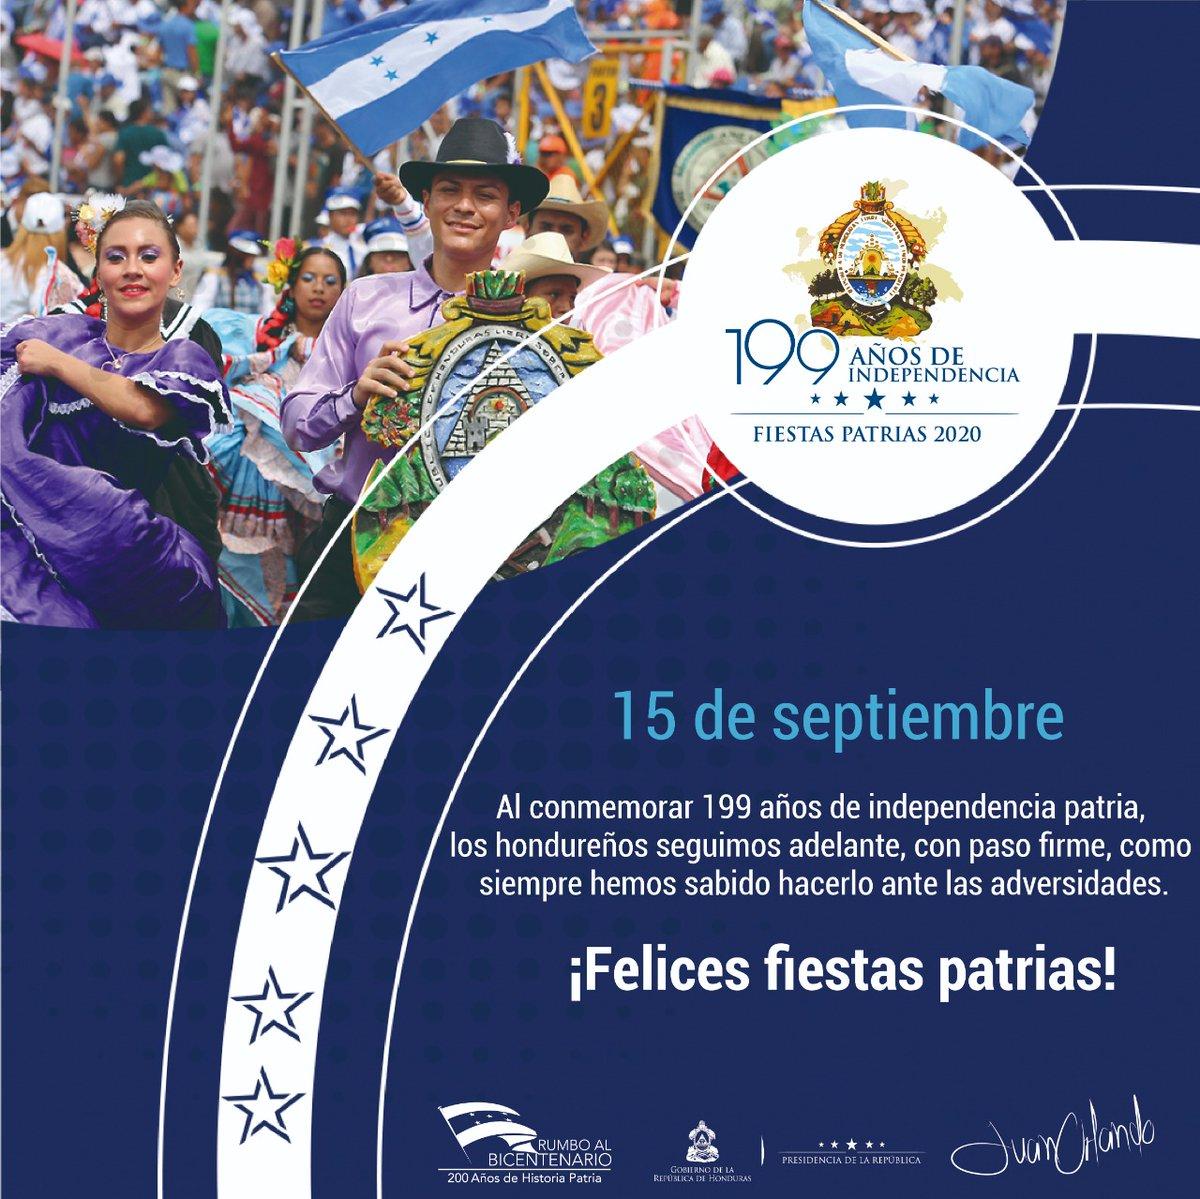 @Presidencia_HN's photo on Honduras